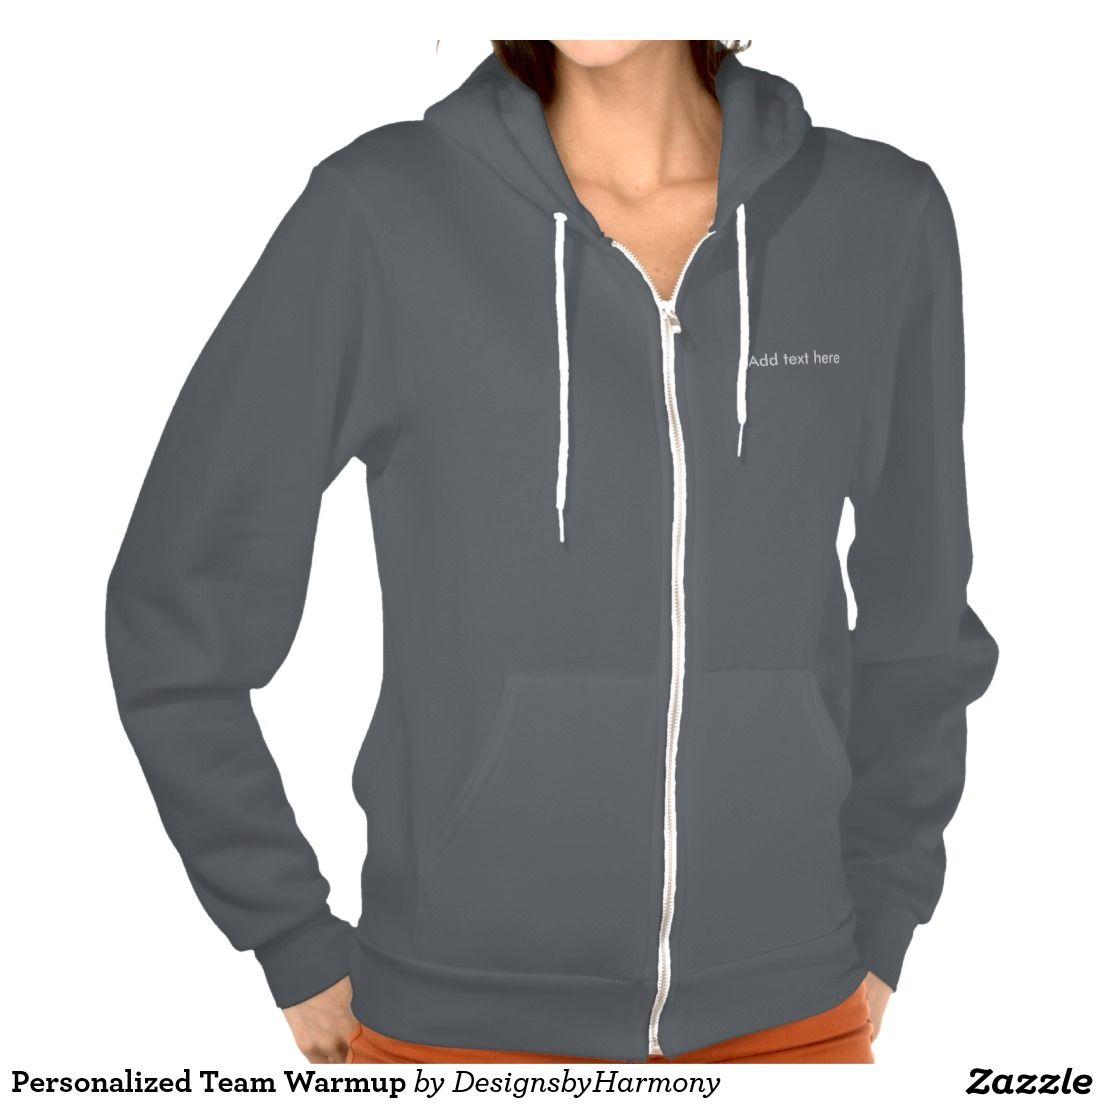 Personalized Team Warmup Sweatshirt